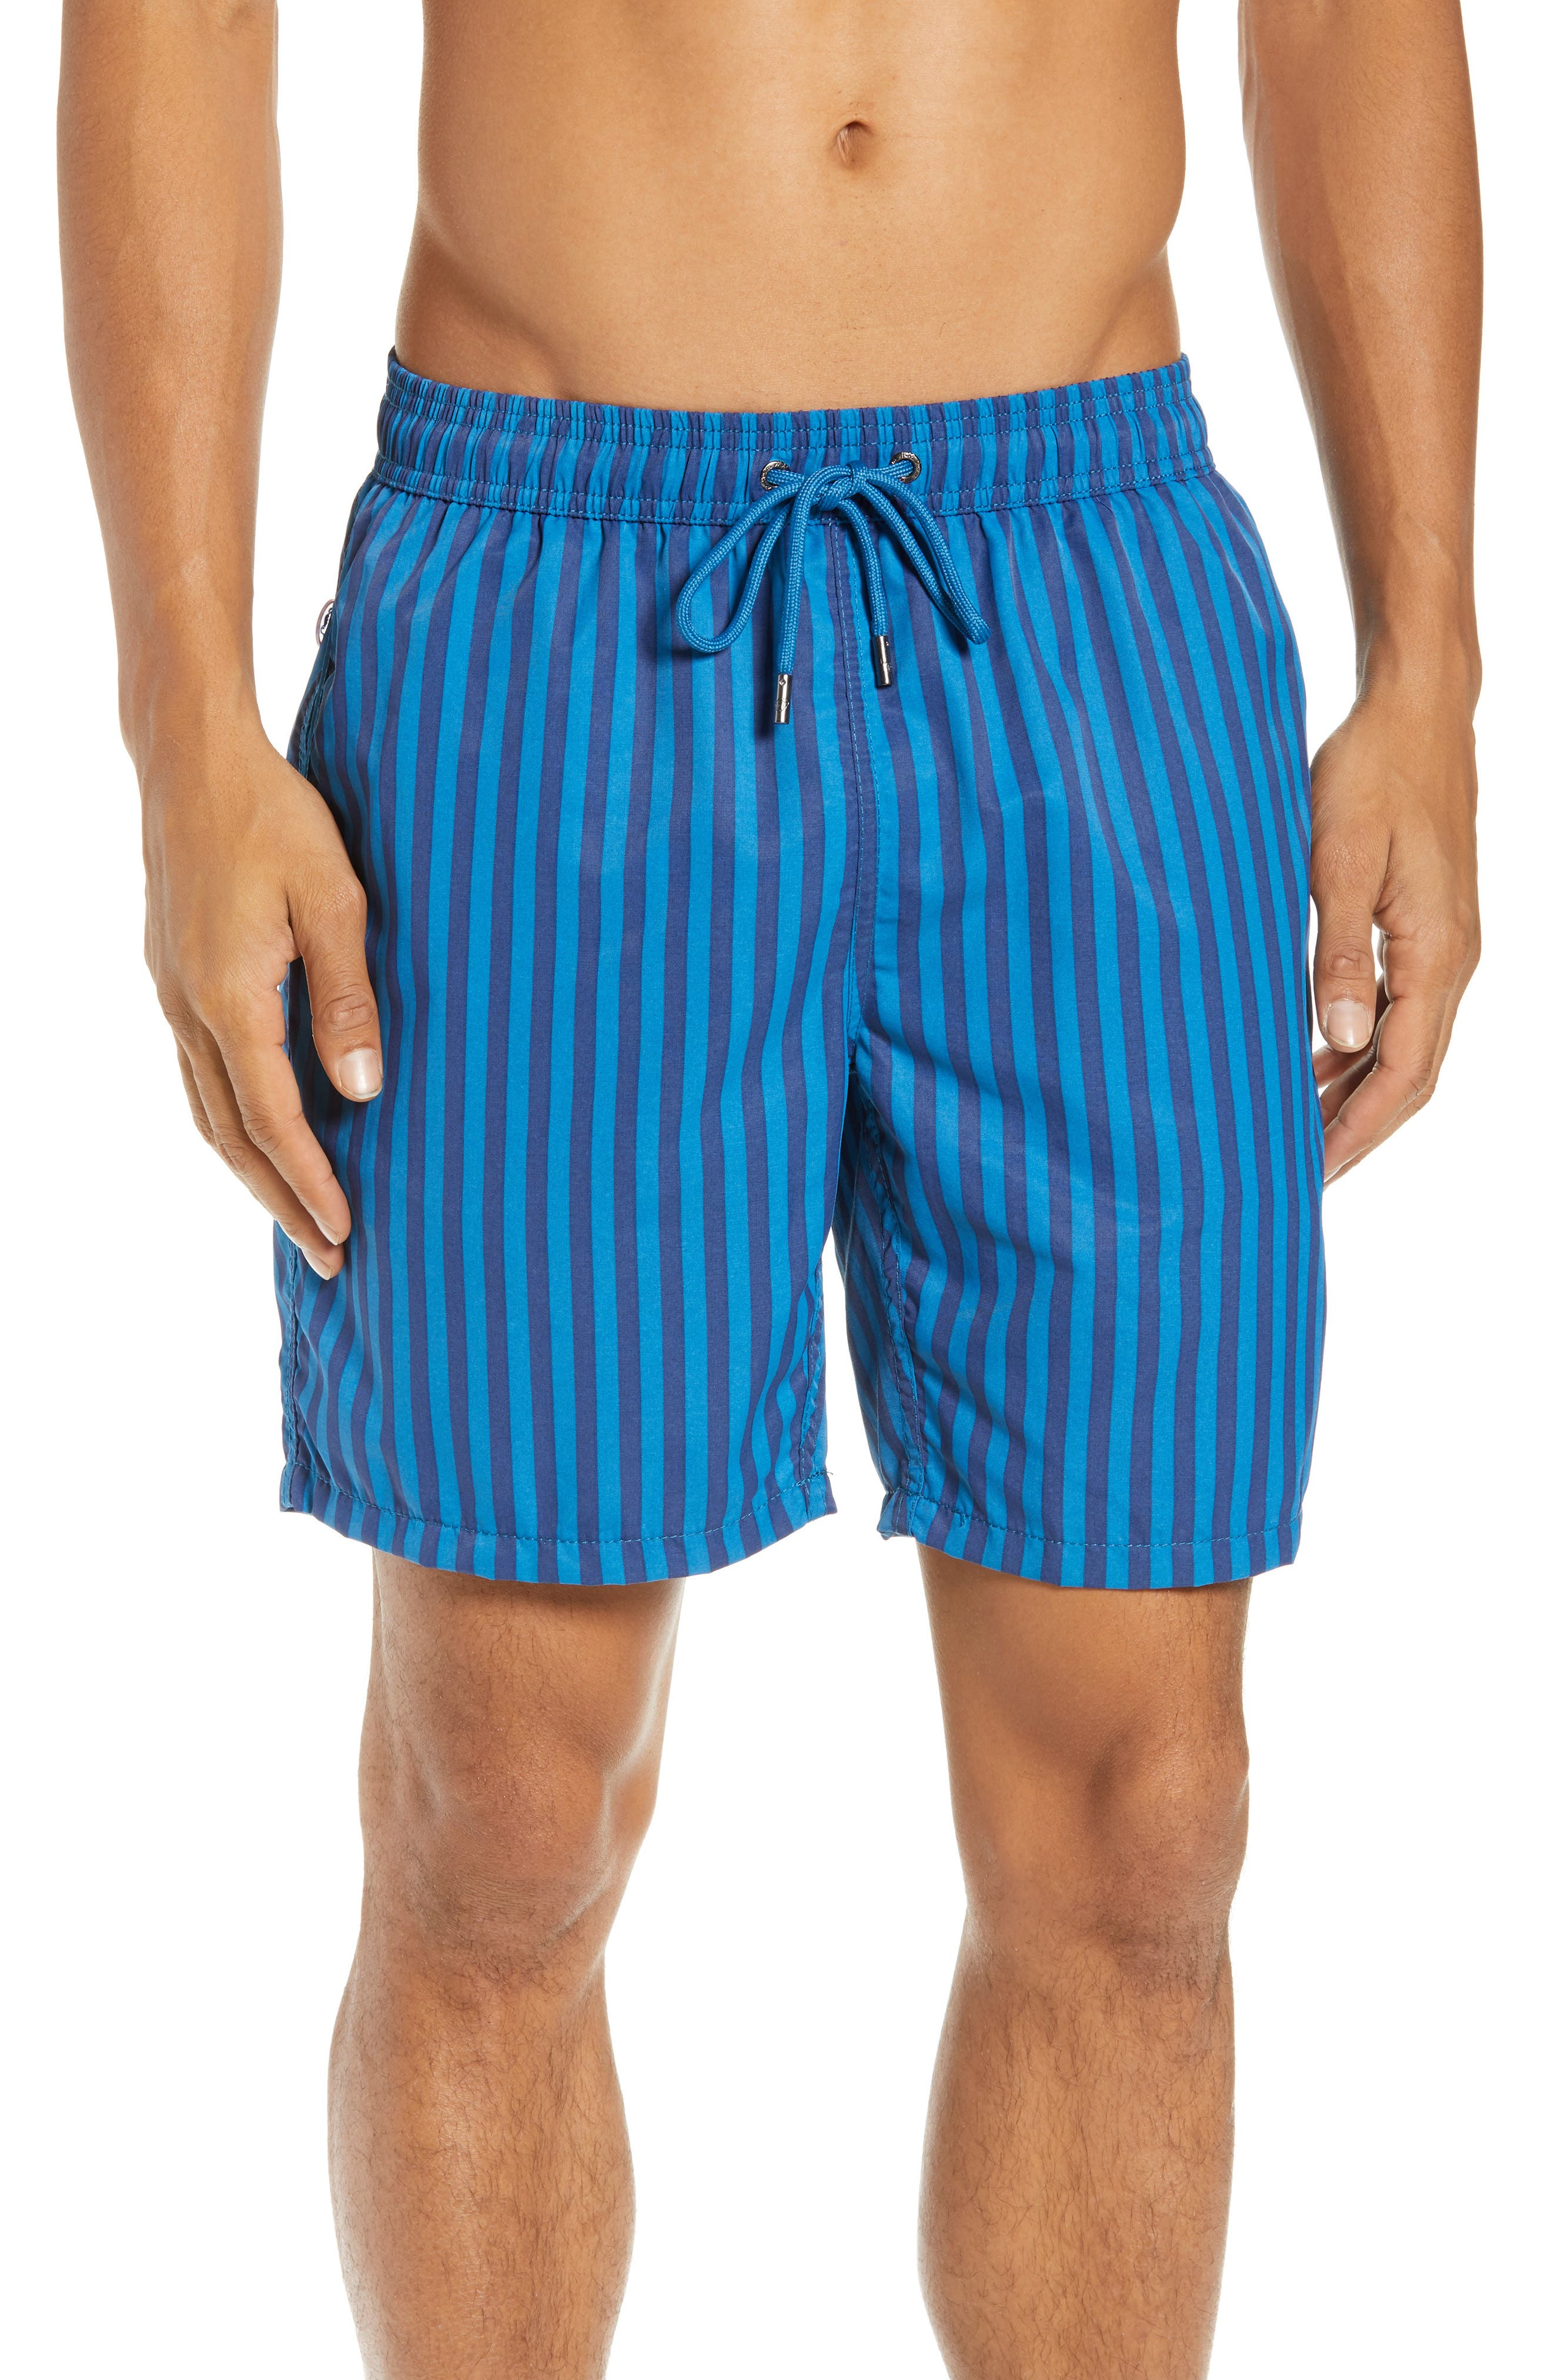 Mr. Swim Cabana Stripe Swim Trunks,                             Main thumbnail 1, color,                             NAVY/ ROYAL